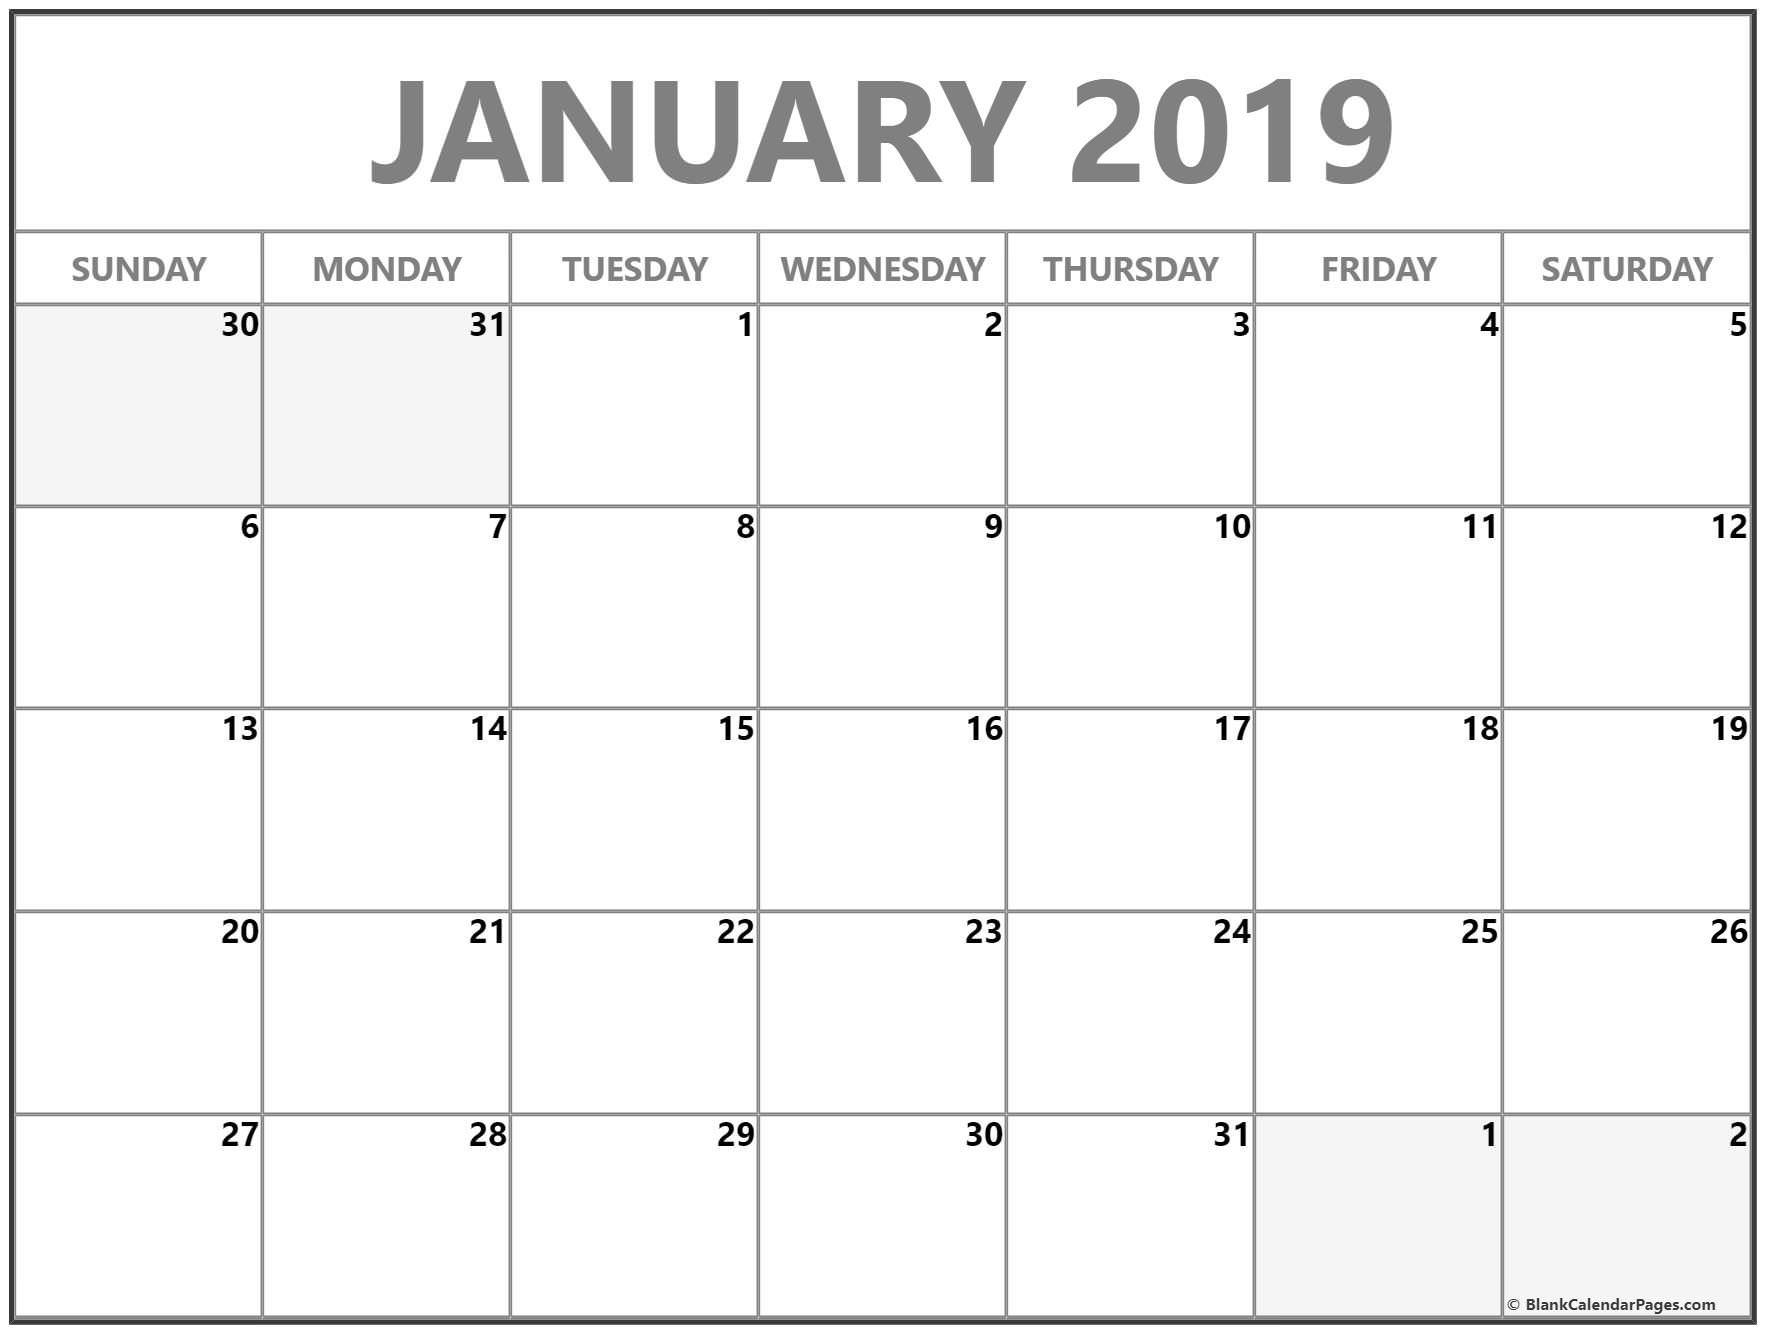 january 2019 blank monthly calendar template printable calendars rh pinterest com